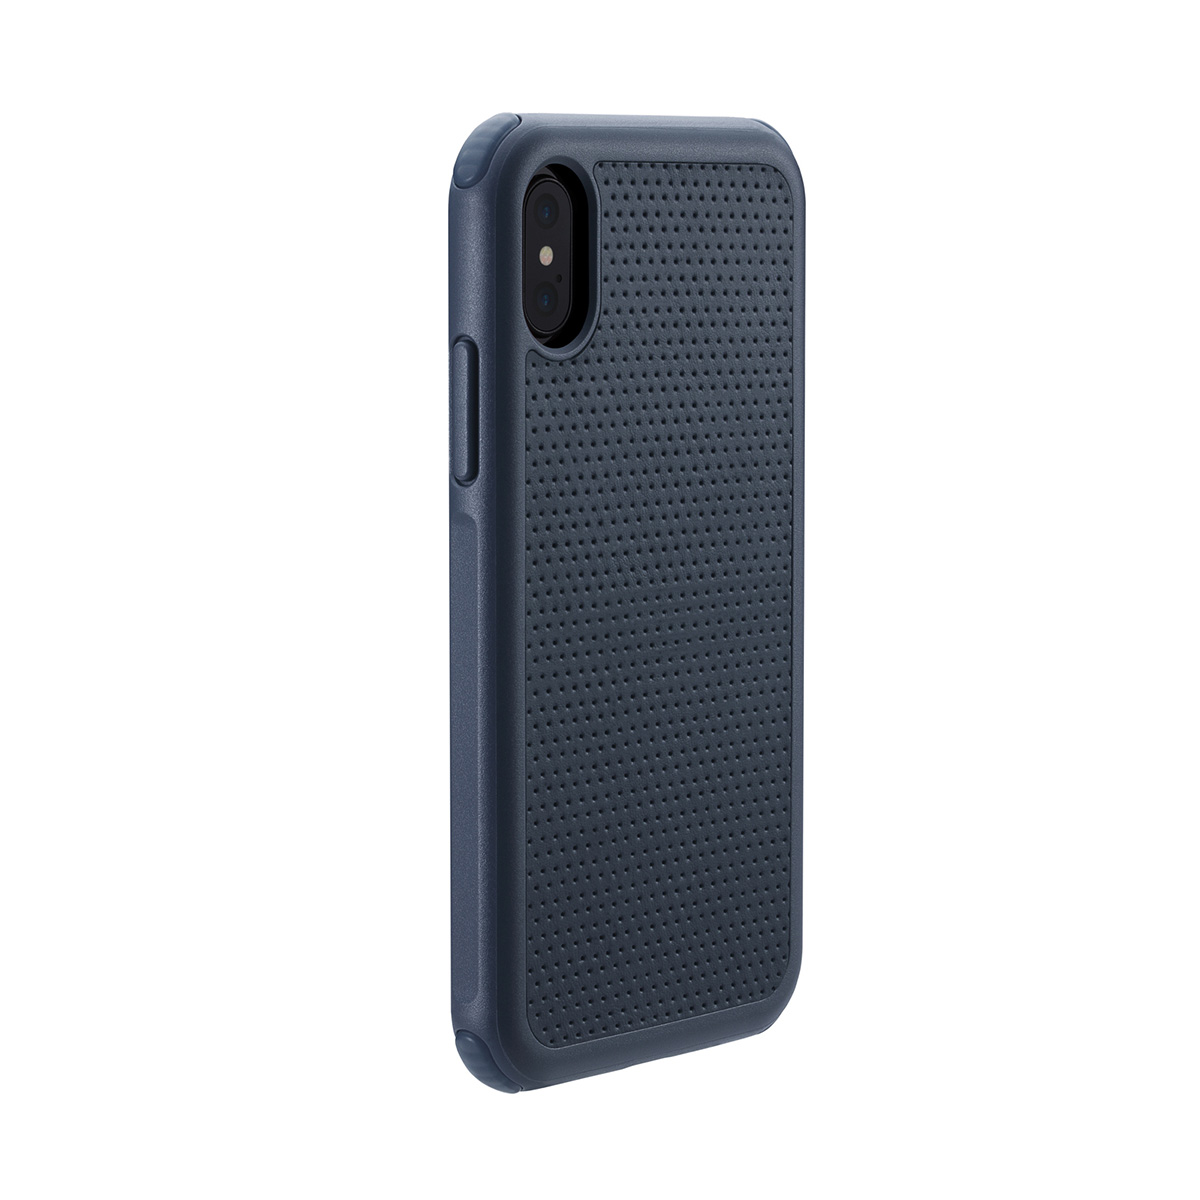 iPhone XS / X ケース Just Mobile Quattro Air(ジャストモバイル クアトロエアー)アイフォン カバー